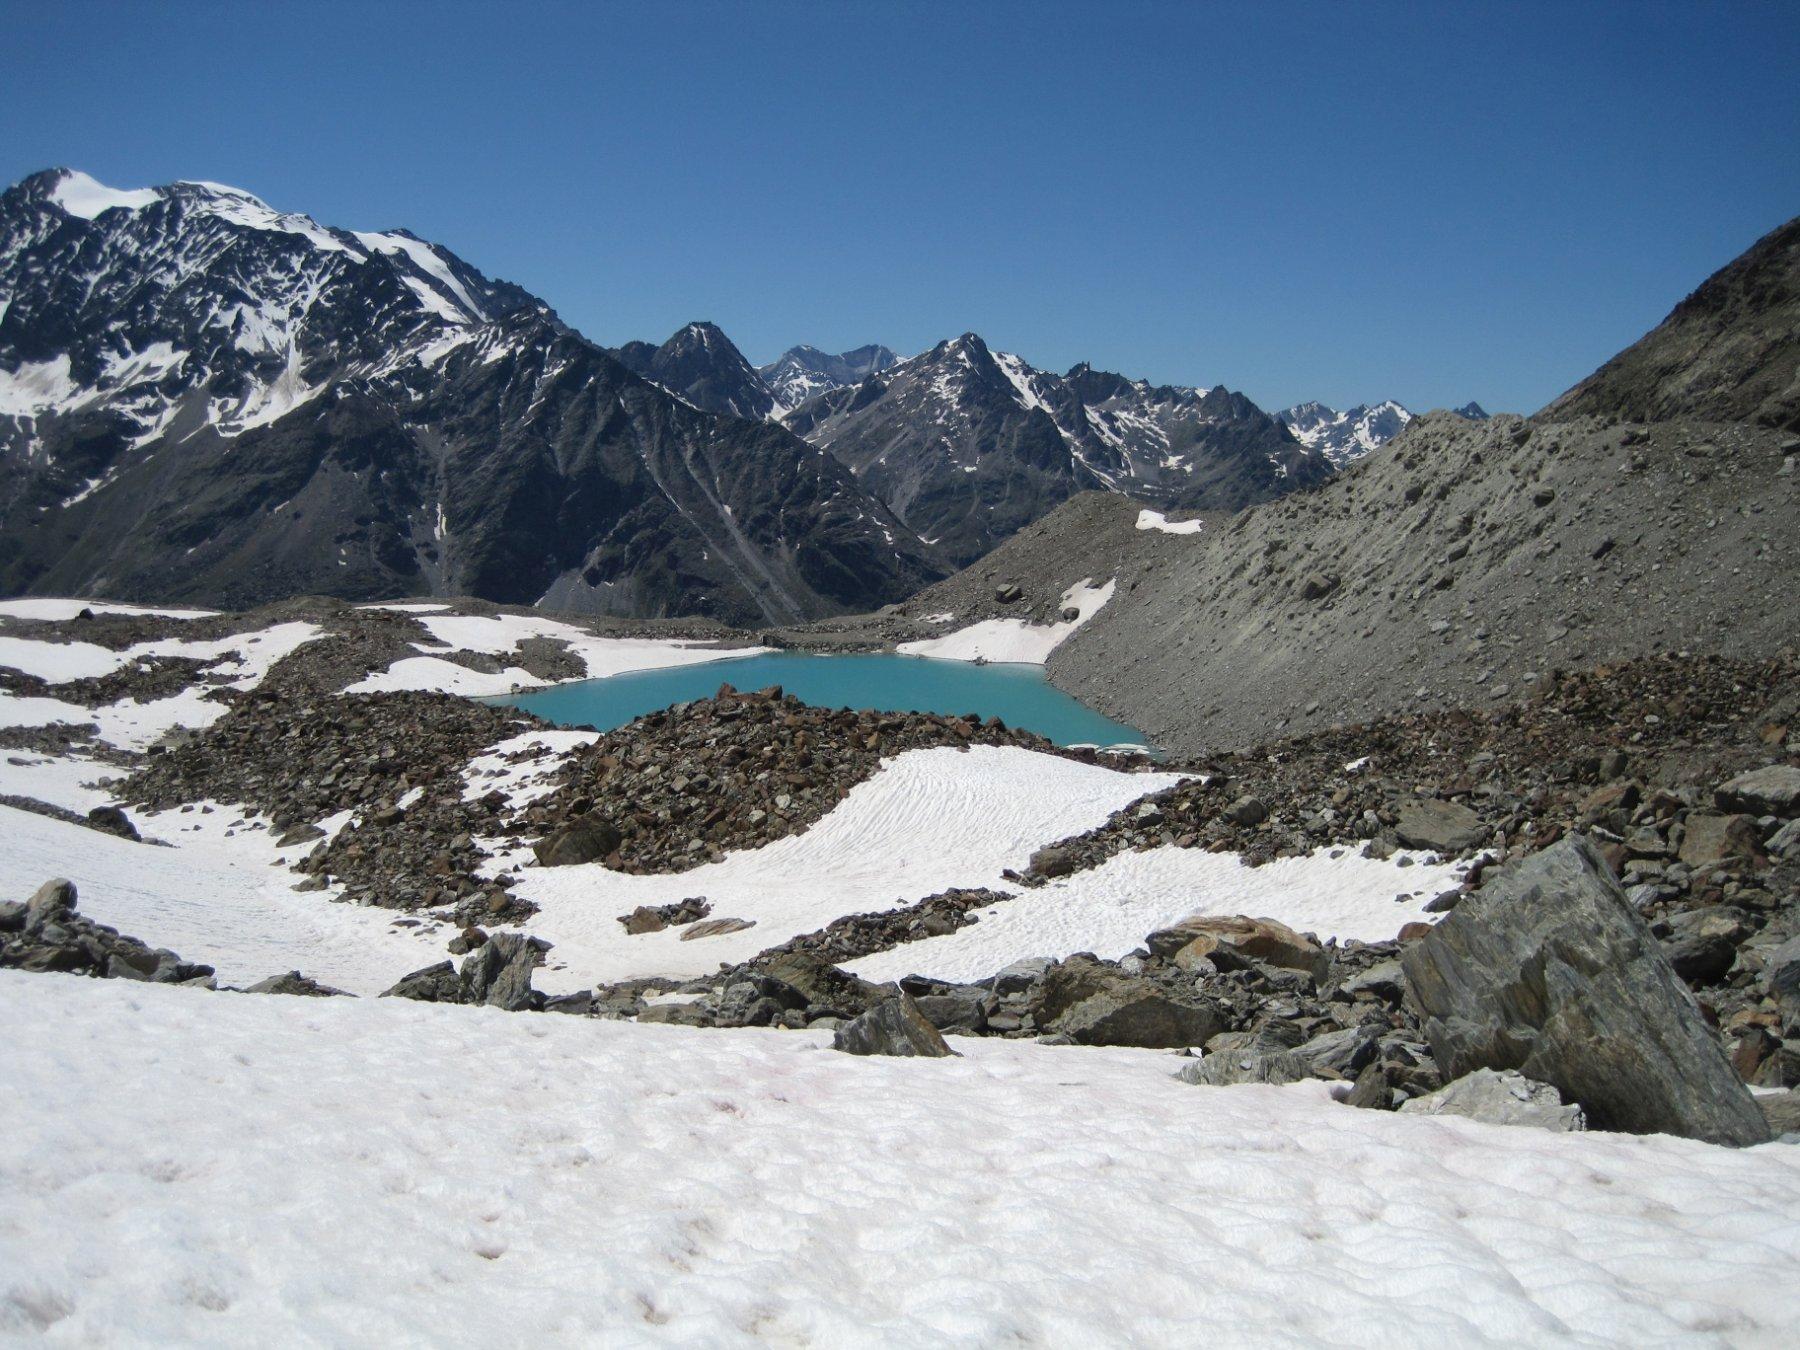 Ultime nevi presso il Fellsee